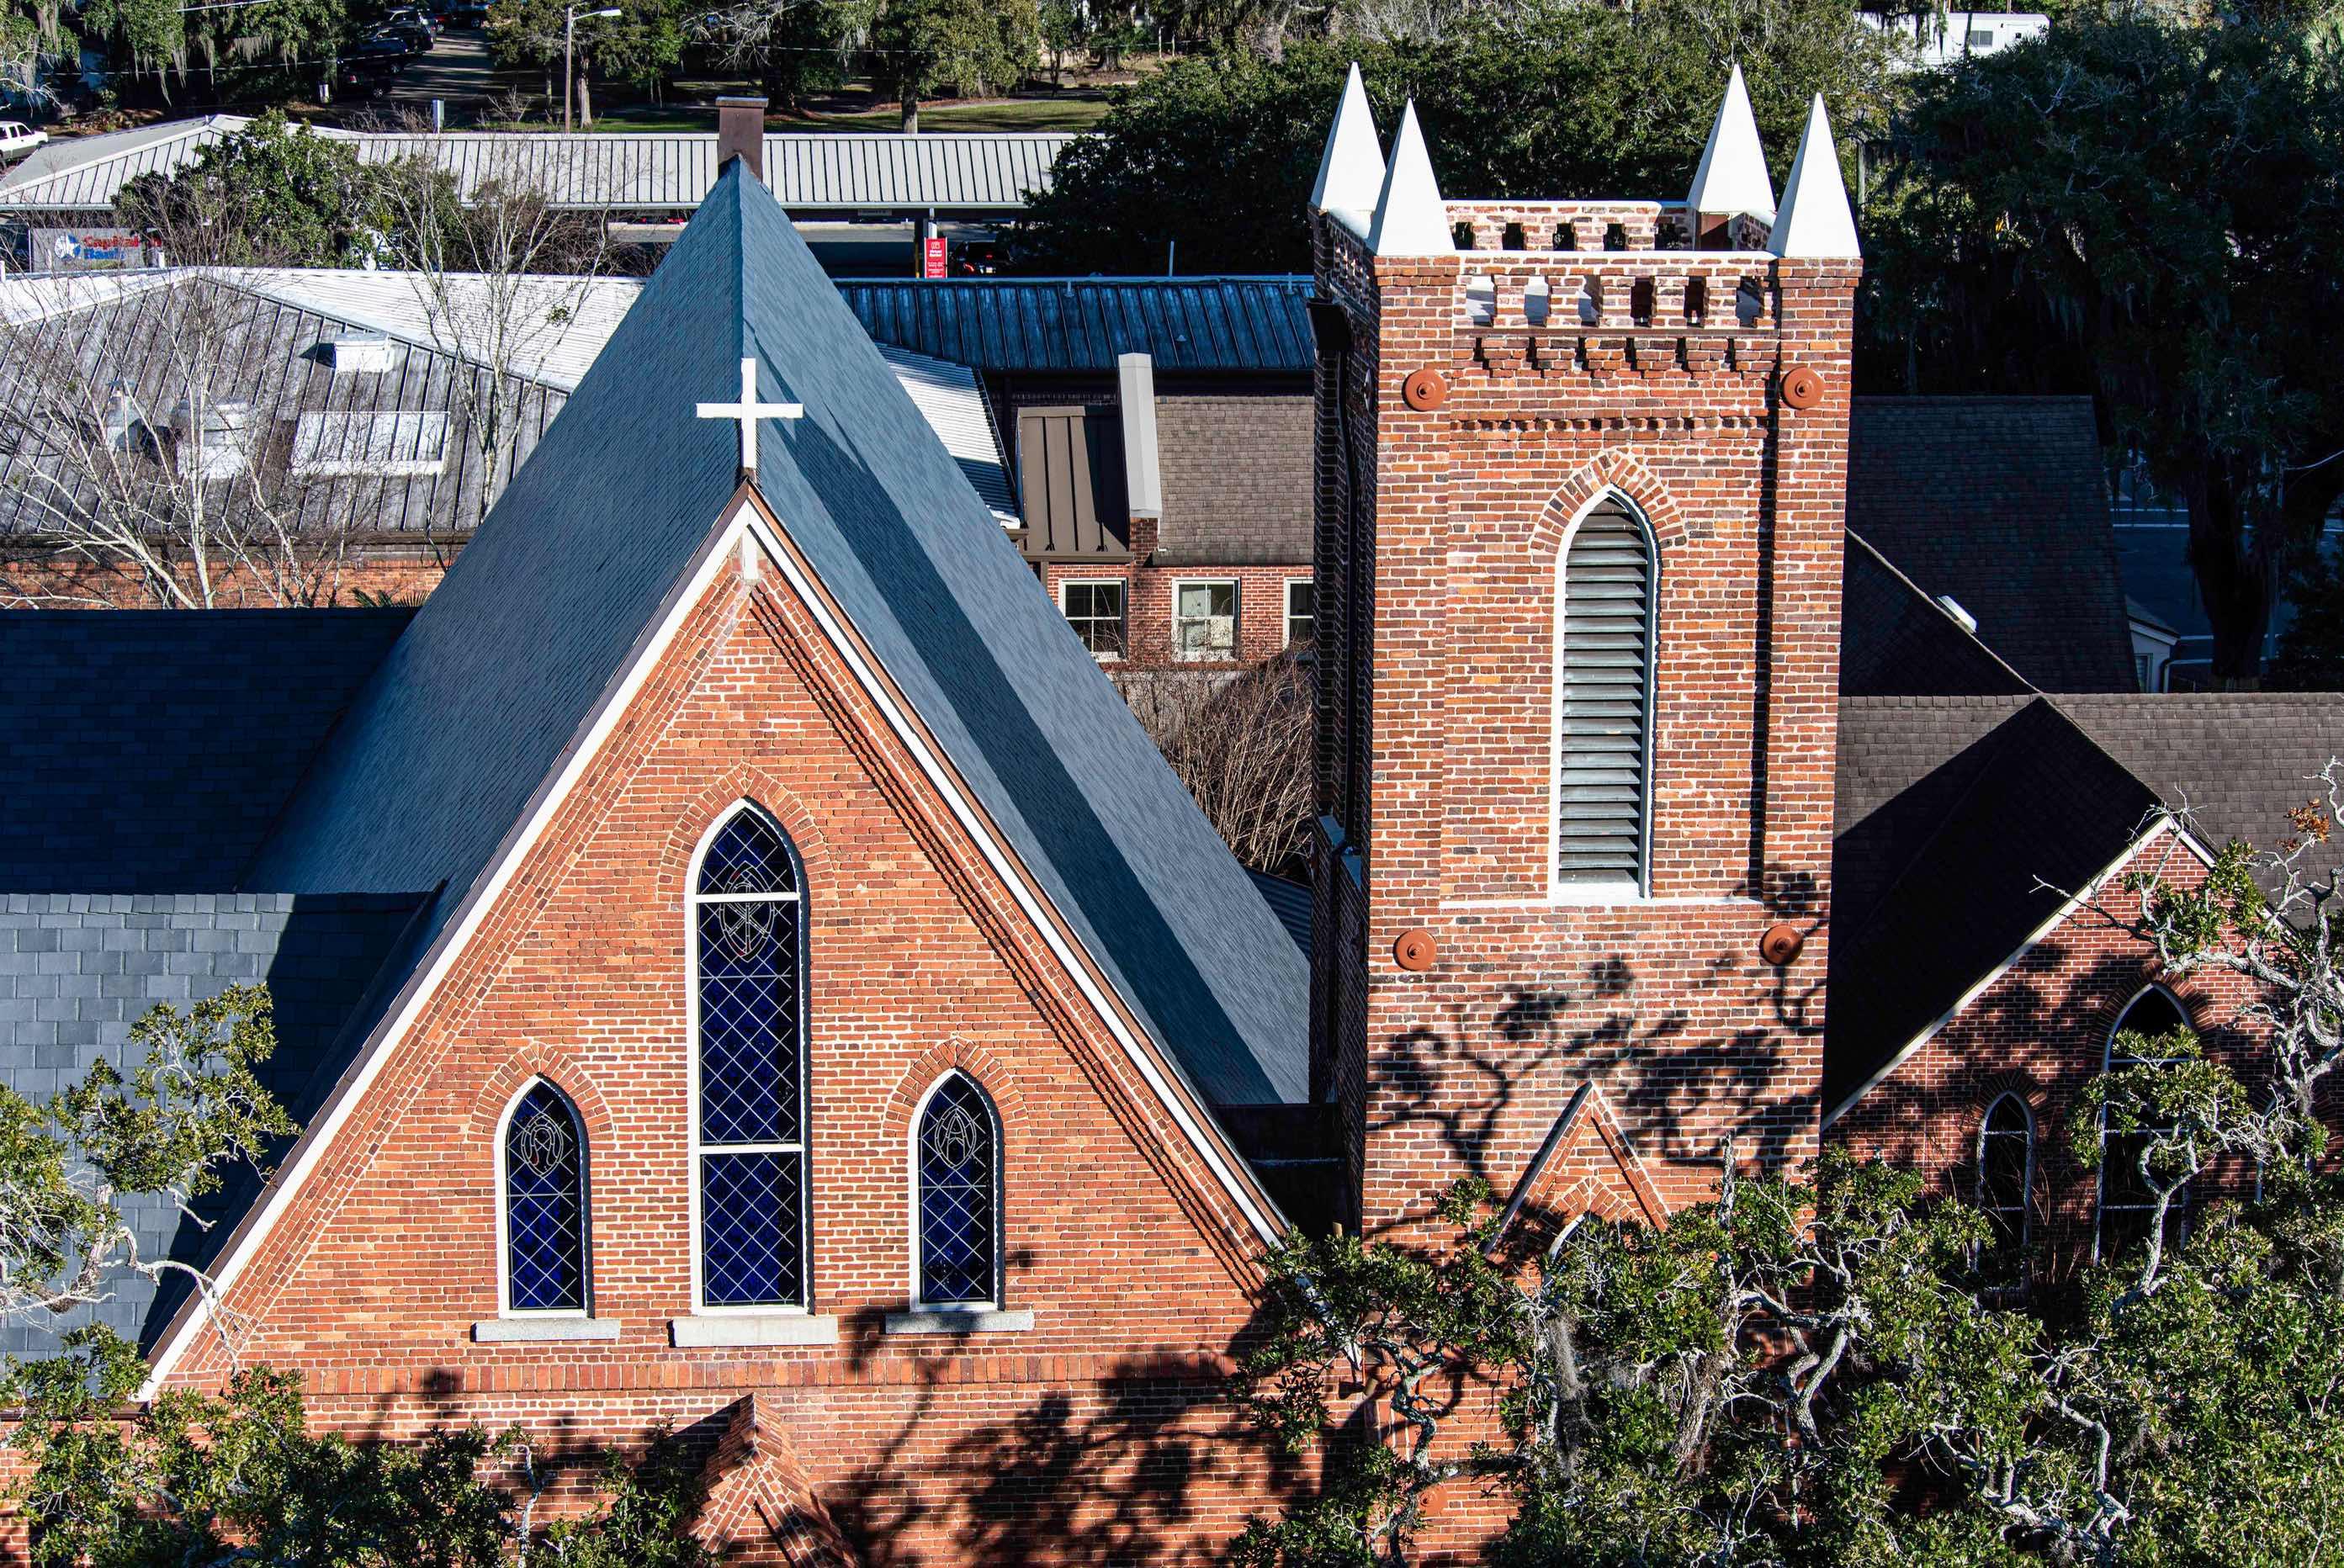 St. John's Episcopal Church preservation & restoration